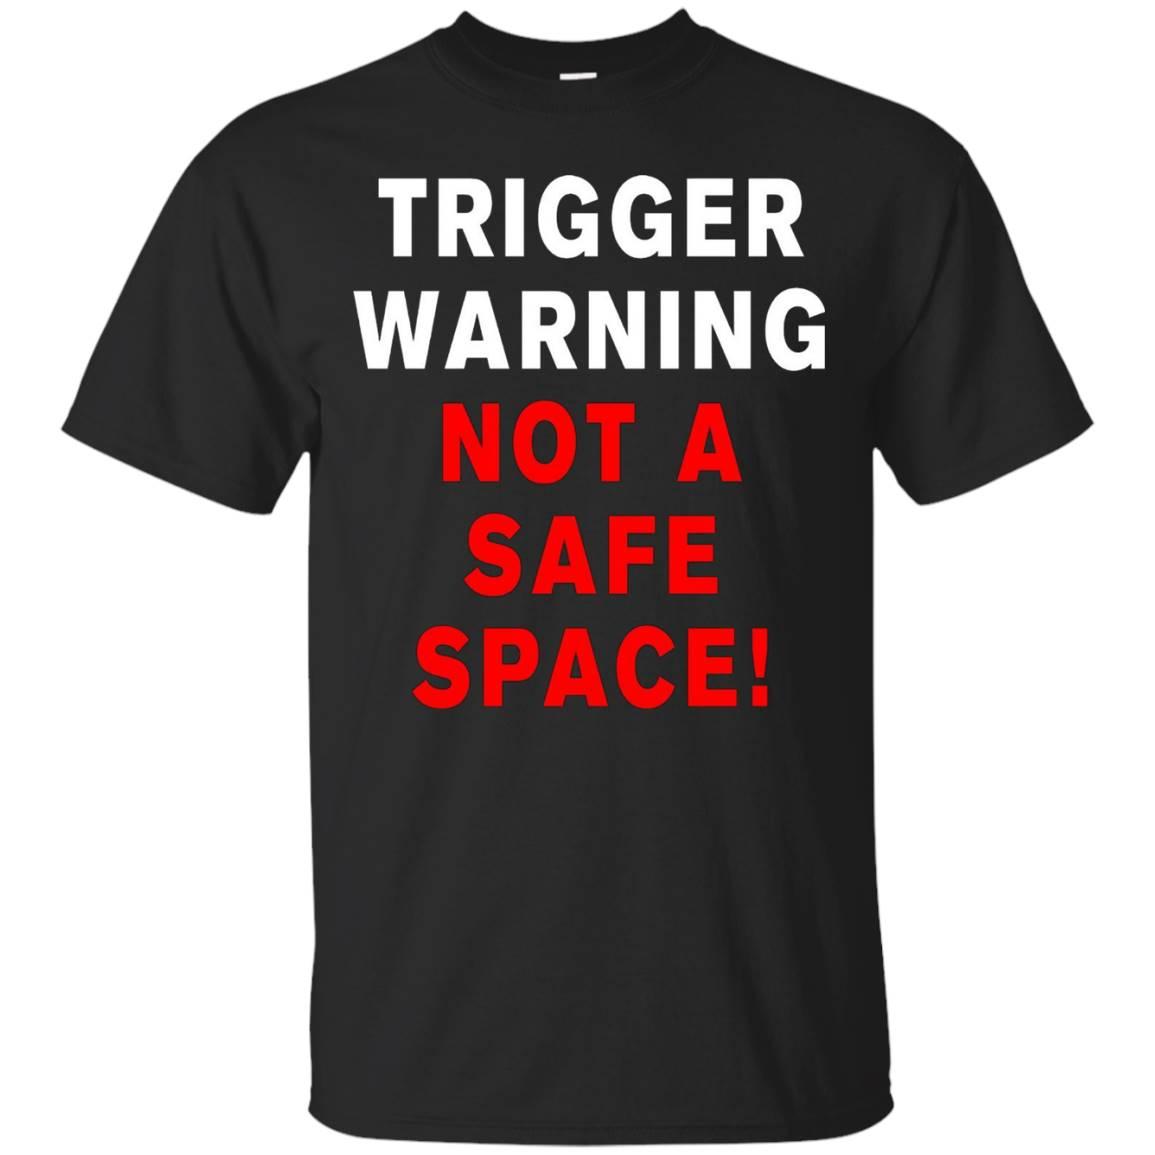 Trigger warning t-shirt not a safe space shirt